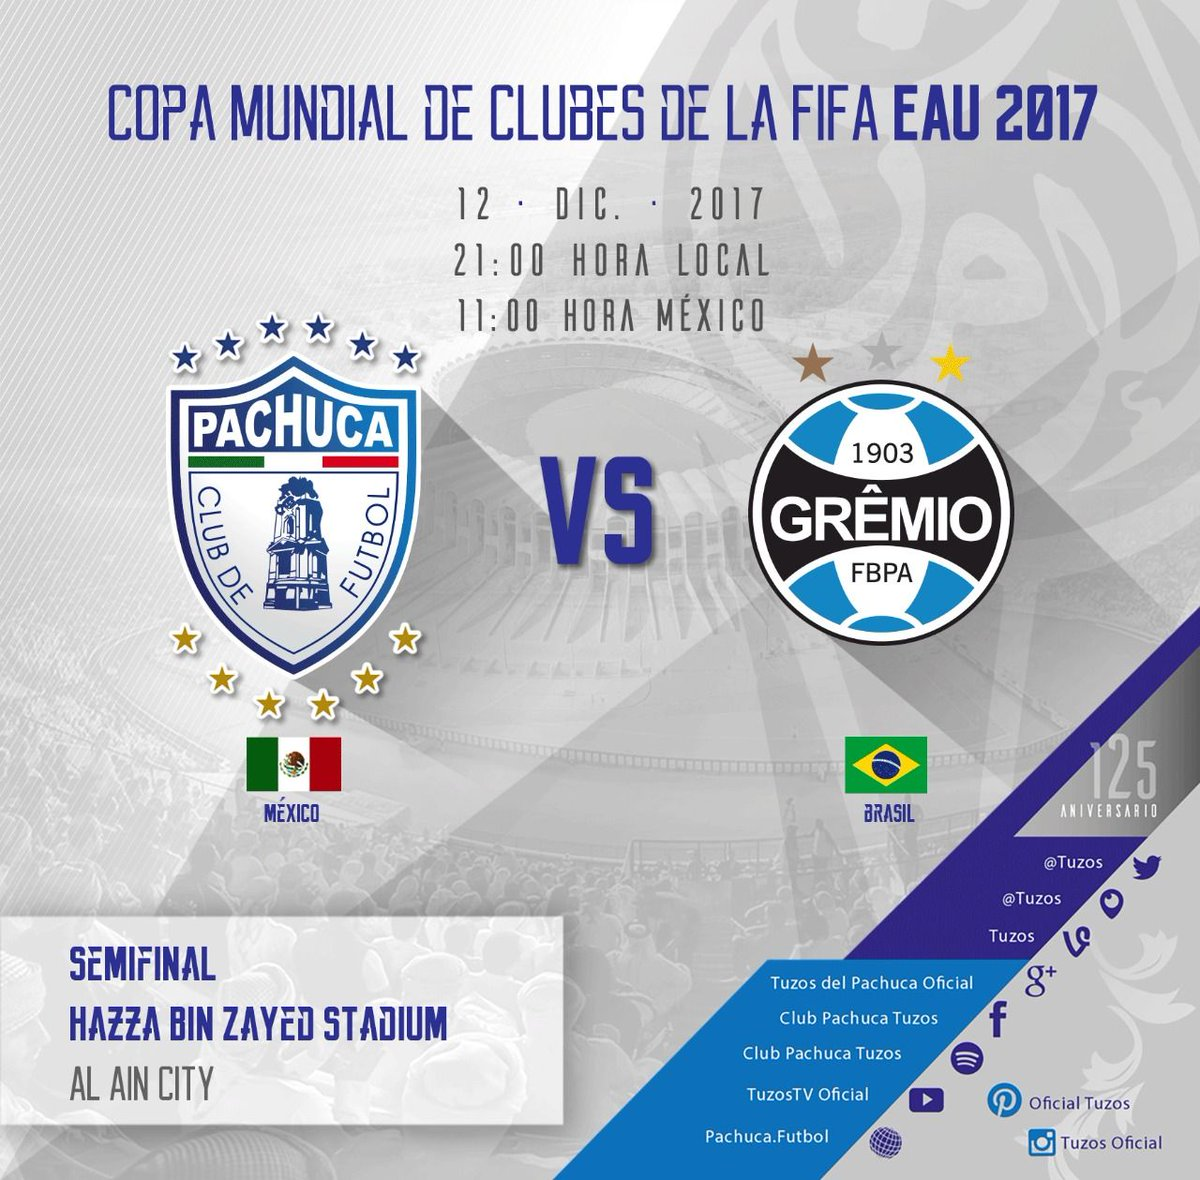 Pachuca juega la semifinal con Gremio. Foto: Pachuca/Twitter @Tuzos